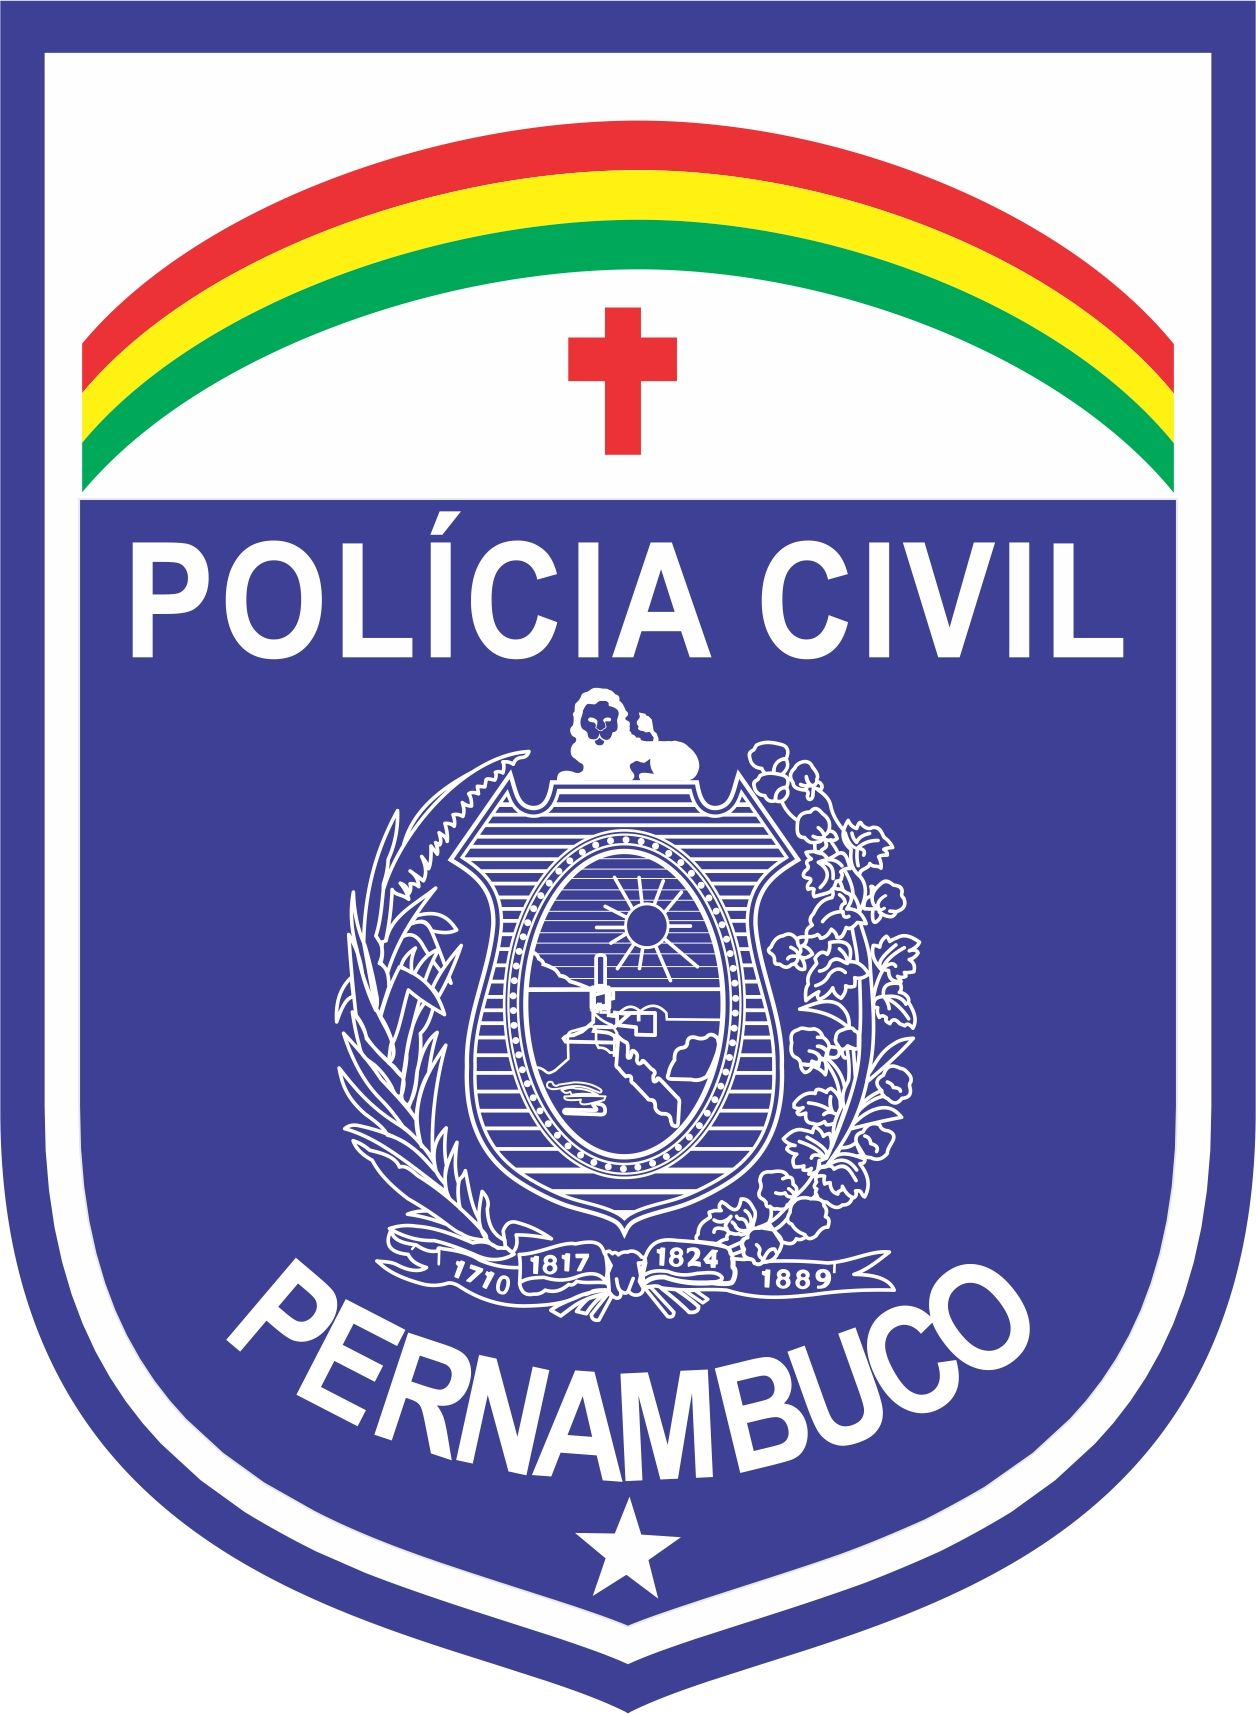 Prof Fabio Madruga Concurso Policia Civil De Pernambuco Cespe